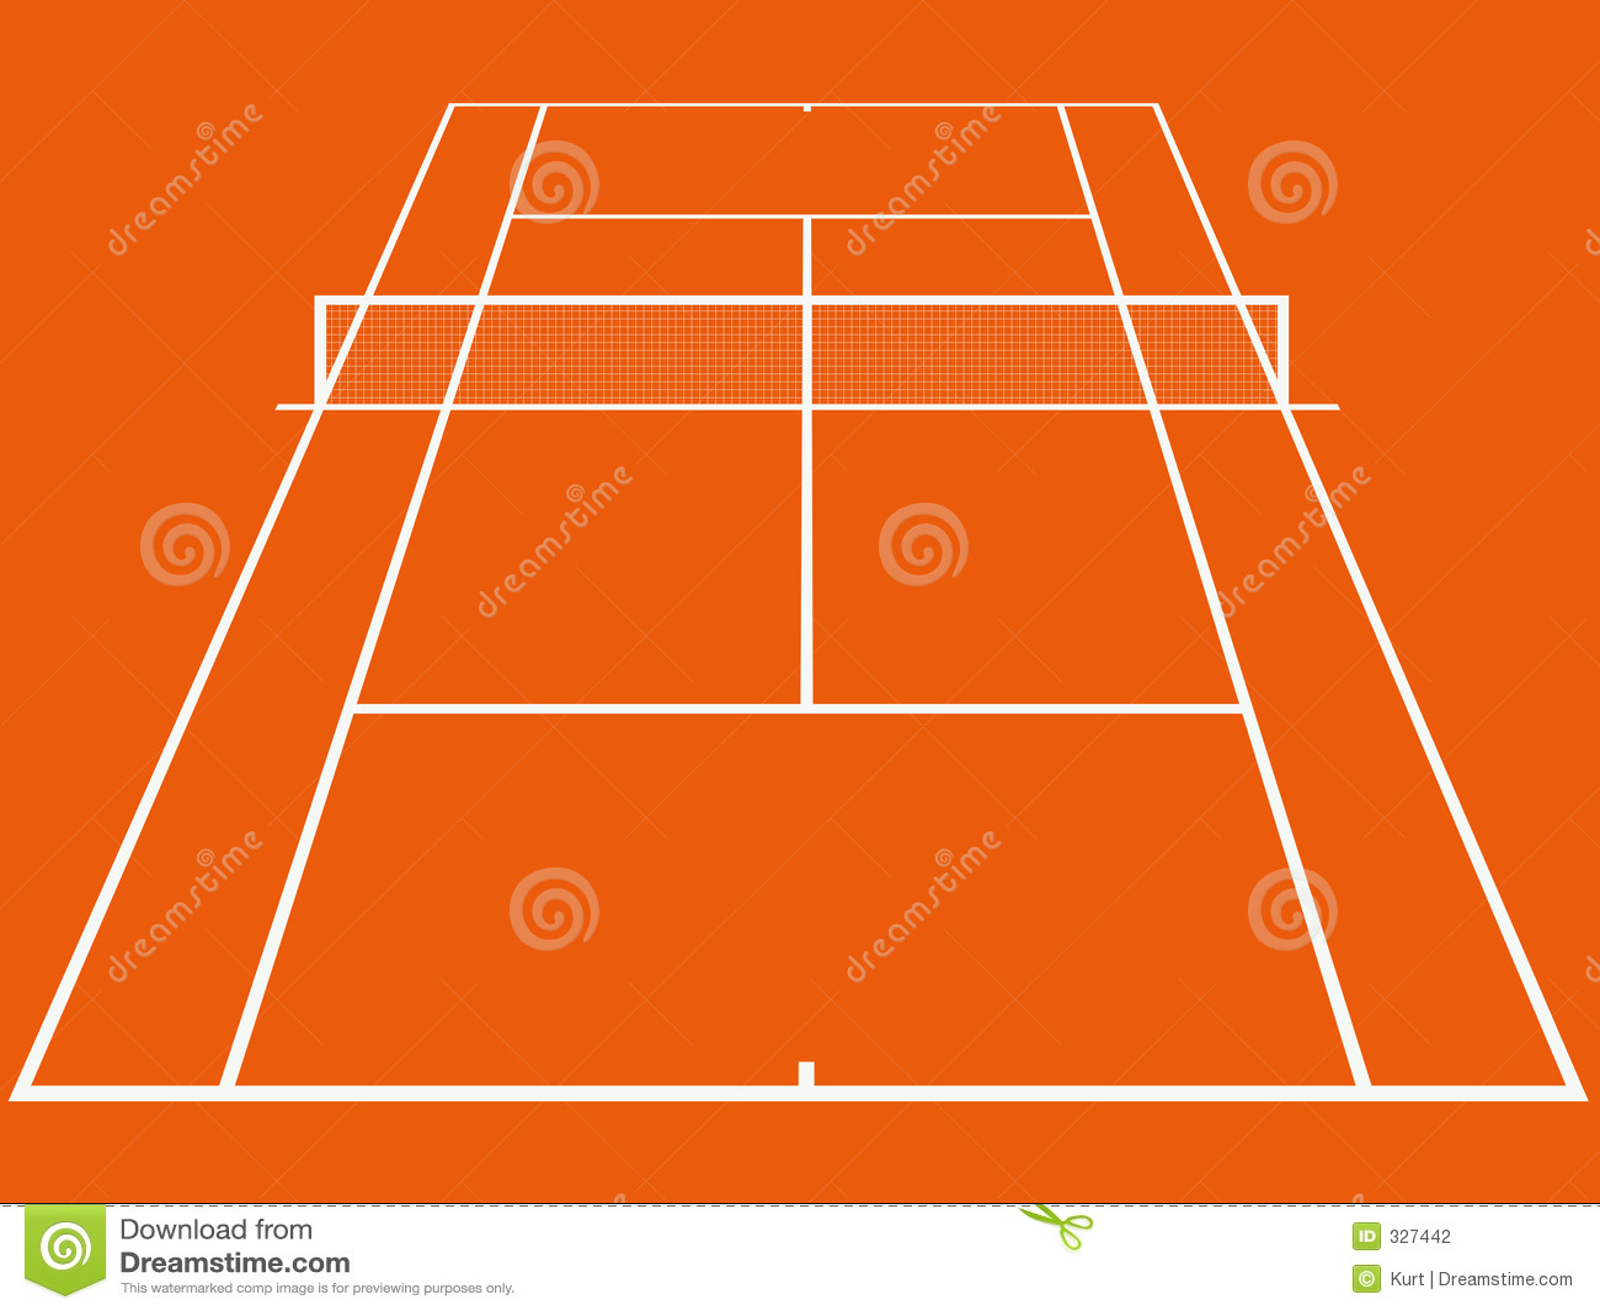 Tennis Court Stock Illustrations – 5,347 Tennis Court Stock ...